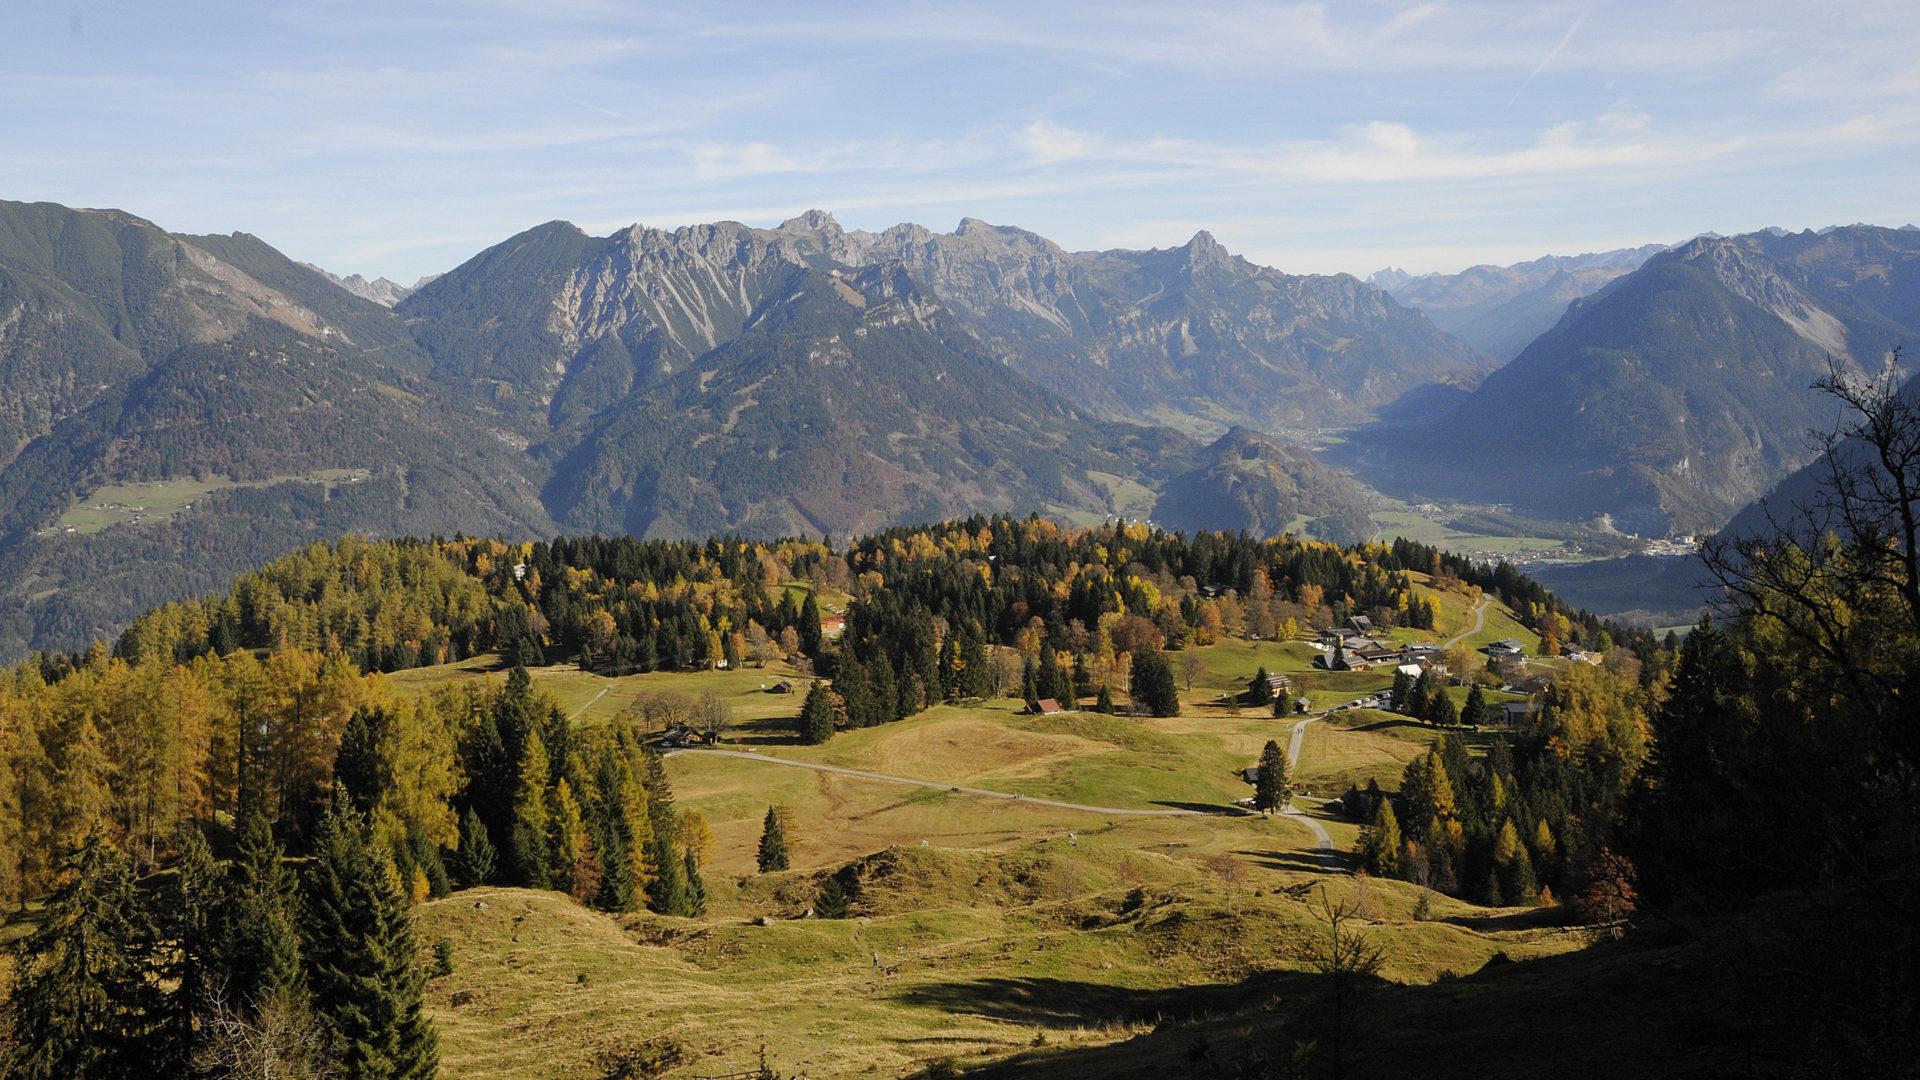 Hochplateau der Tschengla, Rundtour, Wandern im Herbst © Peter Freiberger / Vorarlberg Tourismus